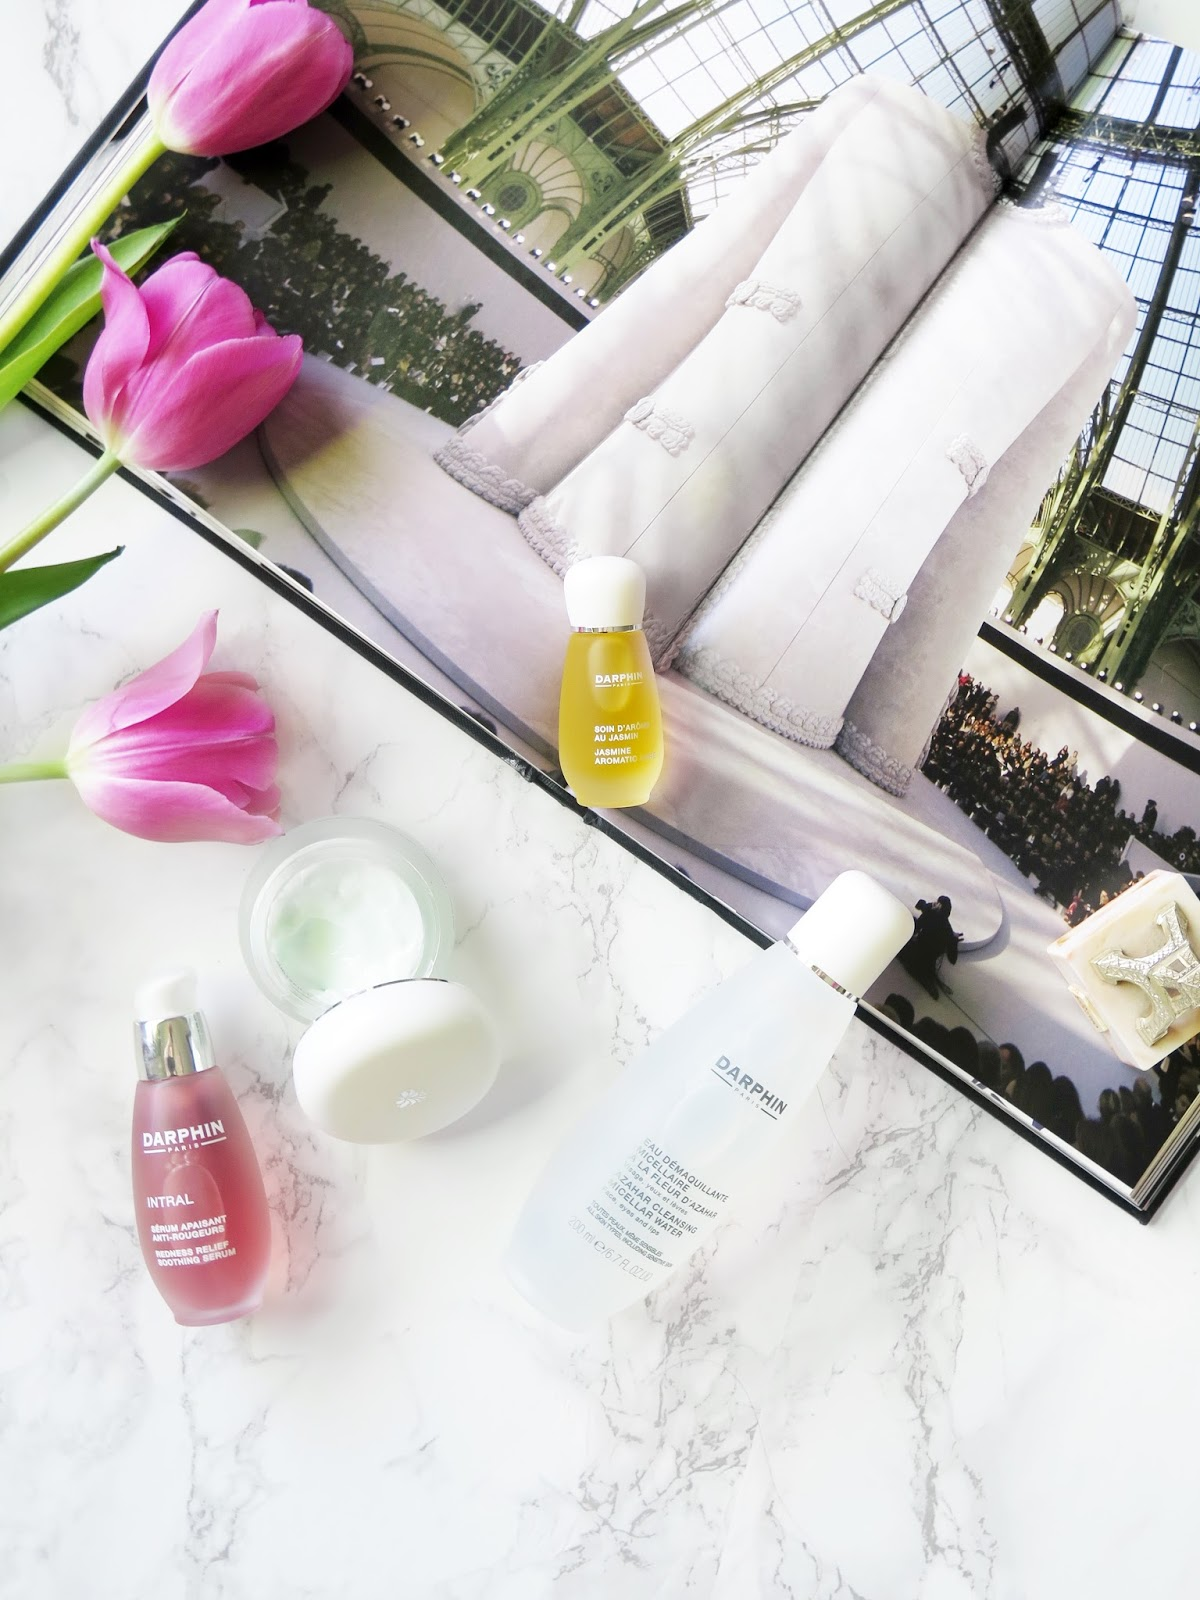 Be Parisianne | Experience La Belle Vie Through Darphin Paris | New To Sephora | Review | labellesirene.ca